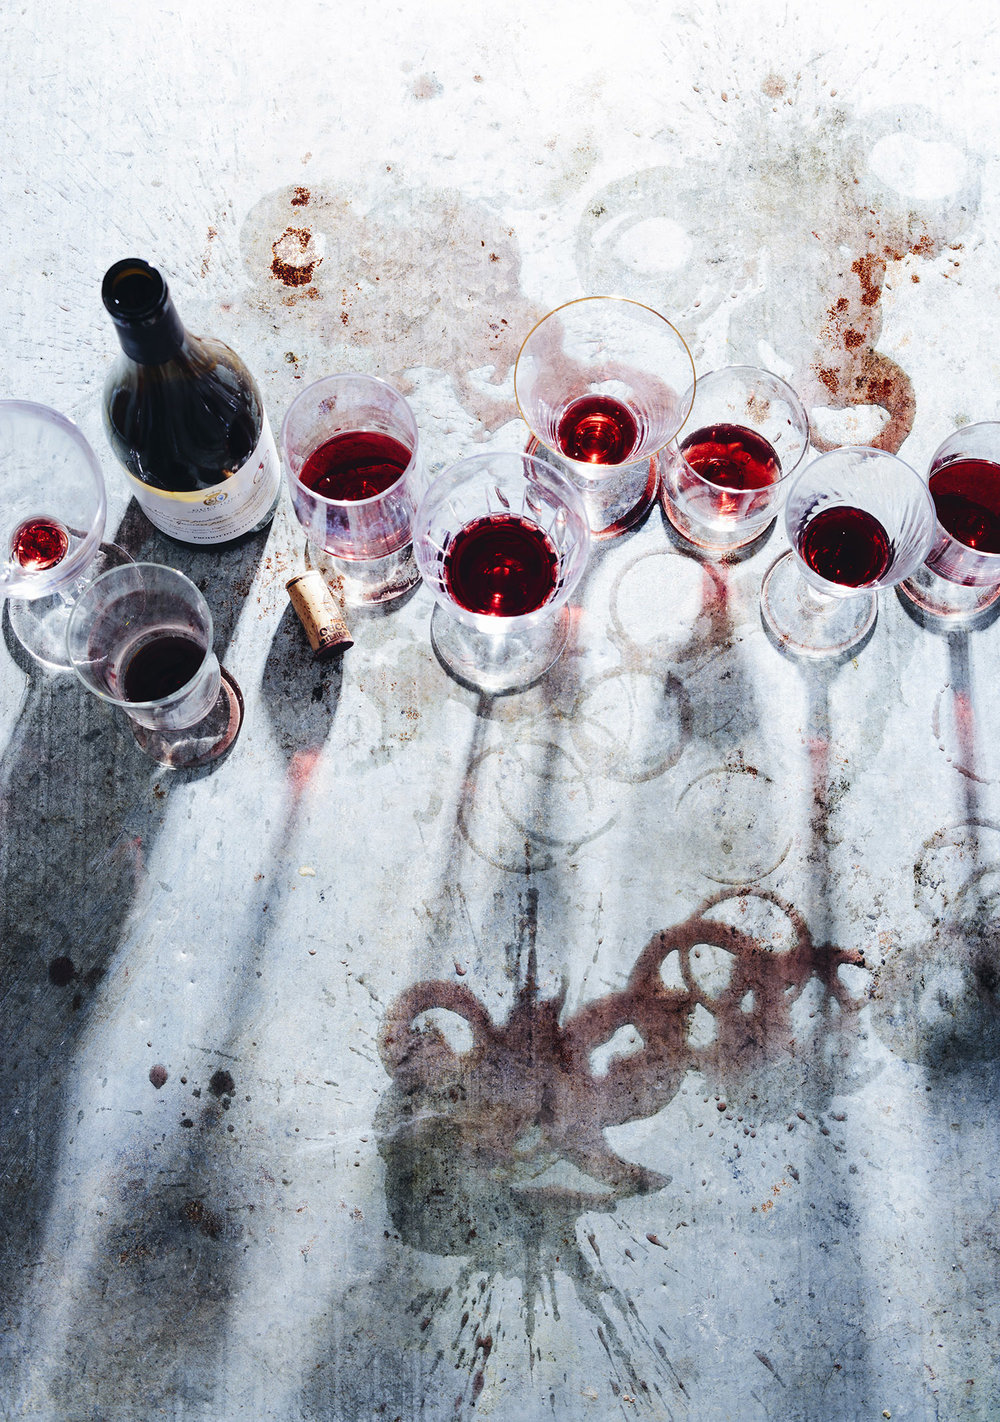 057_wineMess_8496_final.jpg